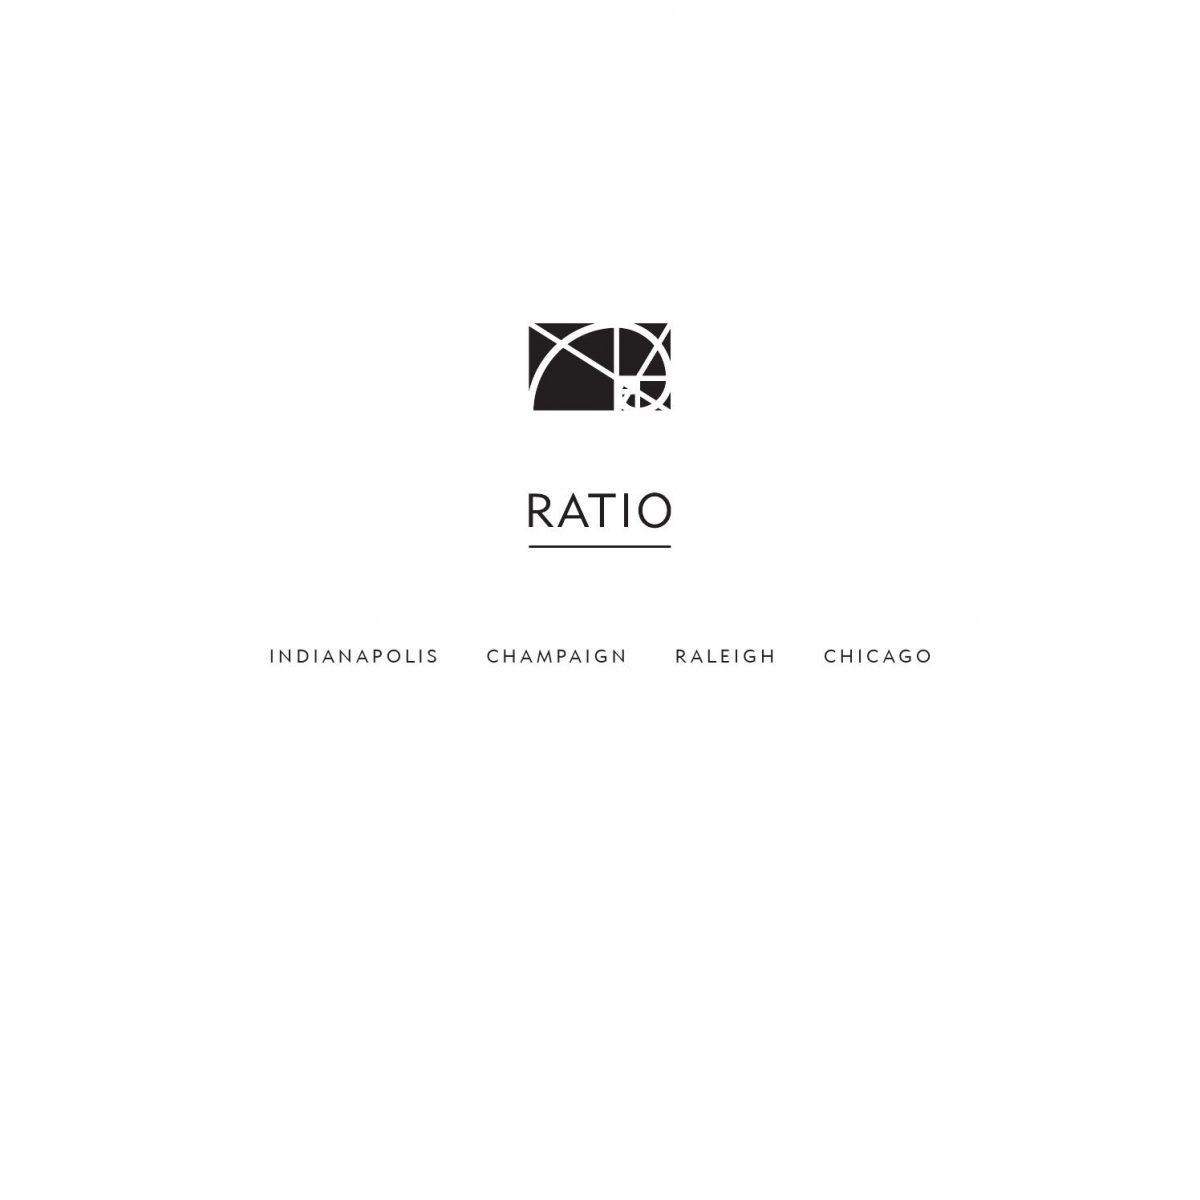 http://www.petkovstudio.com/bg/wp-content/uploads/2017/04/page_3-1200x1200.jpg